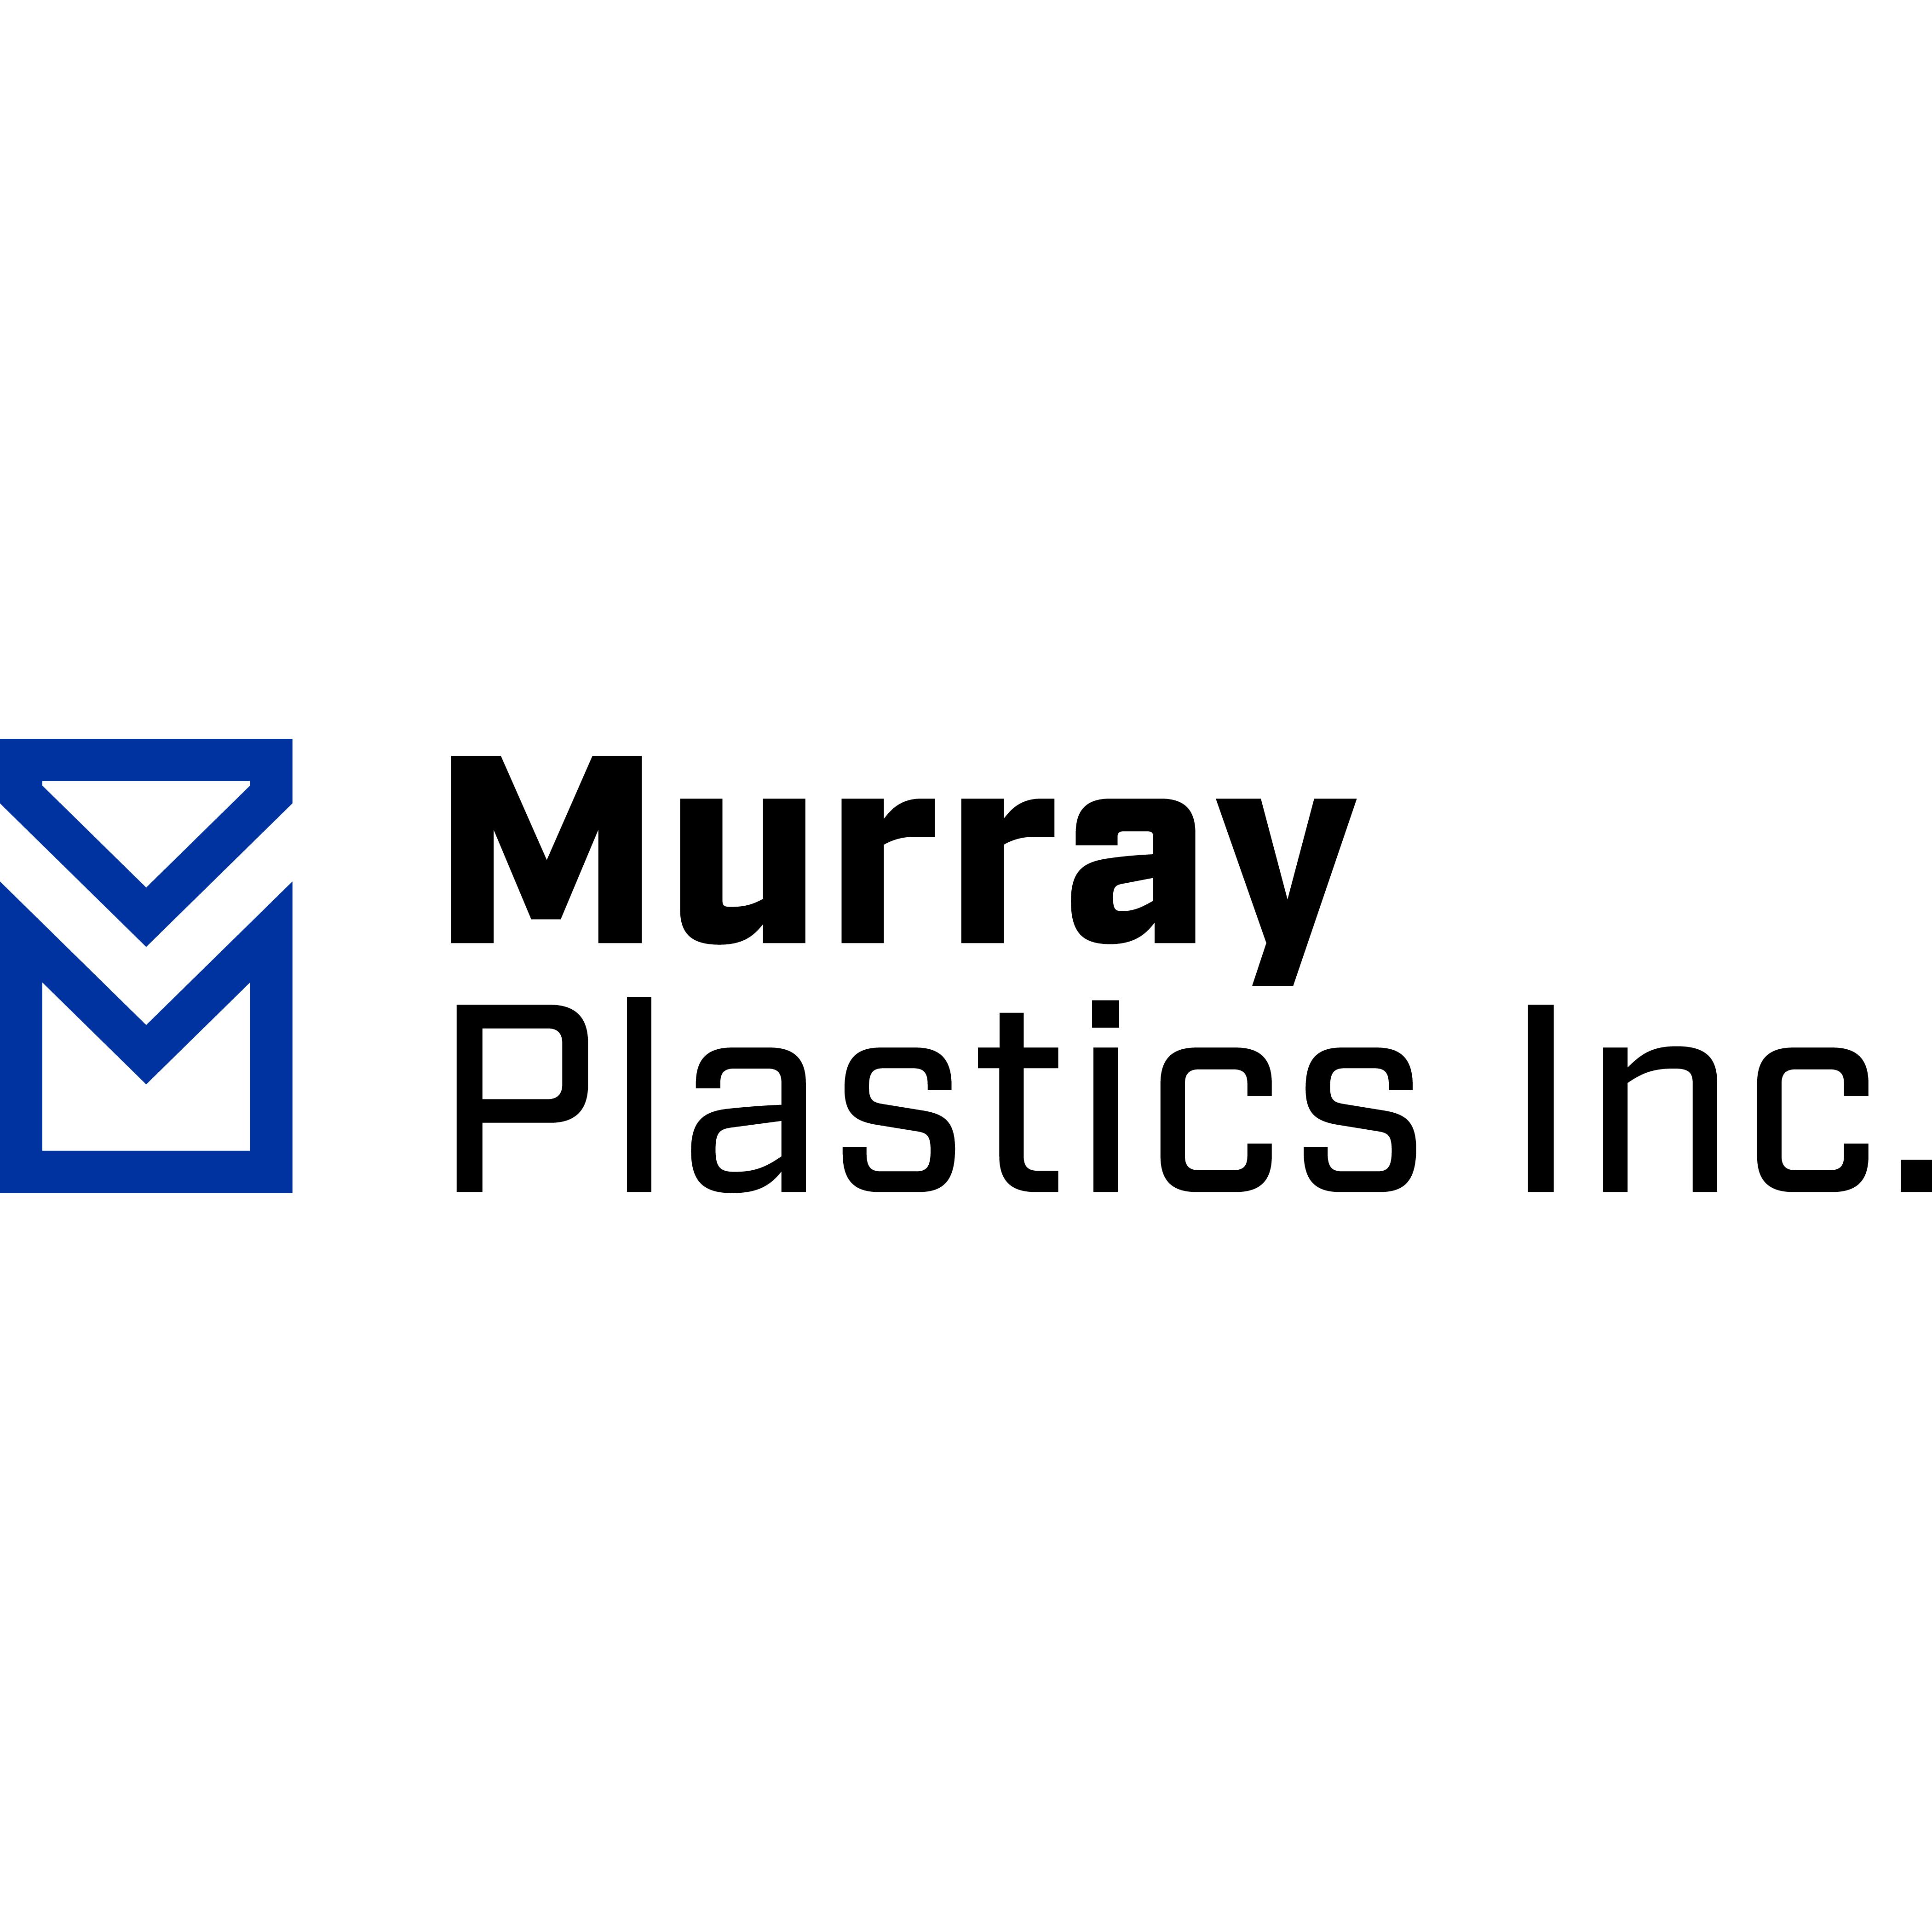 Murray Plastics